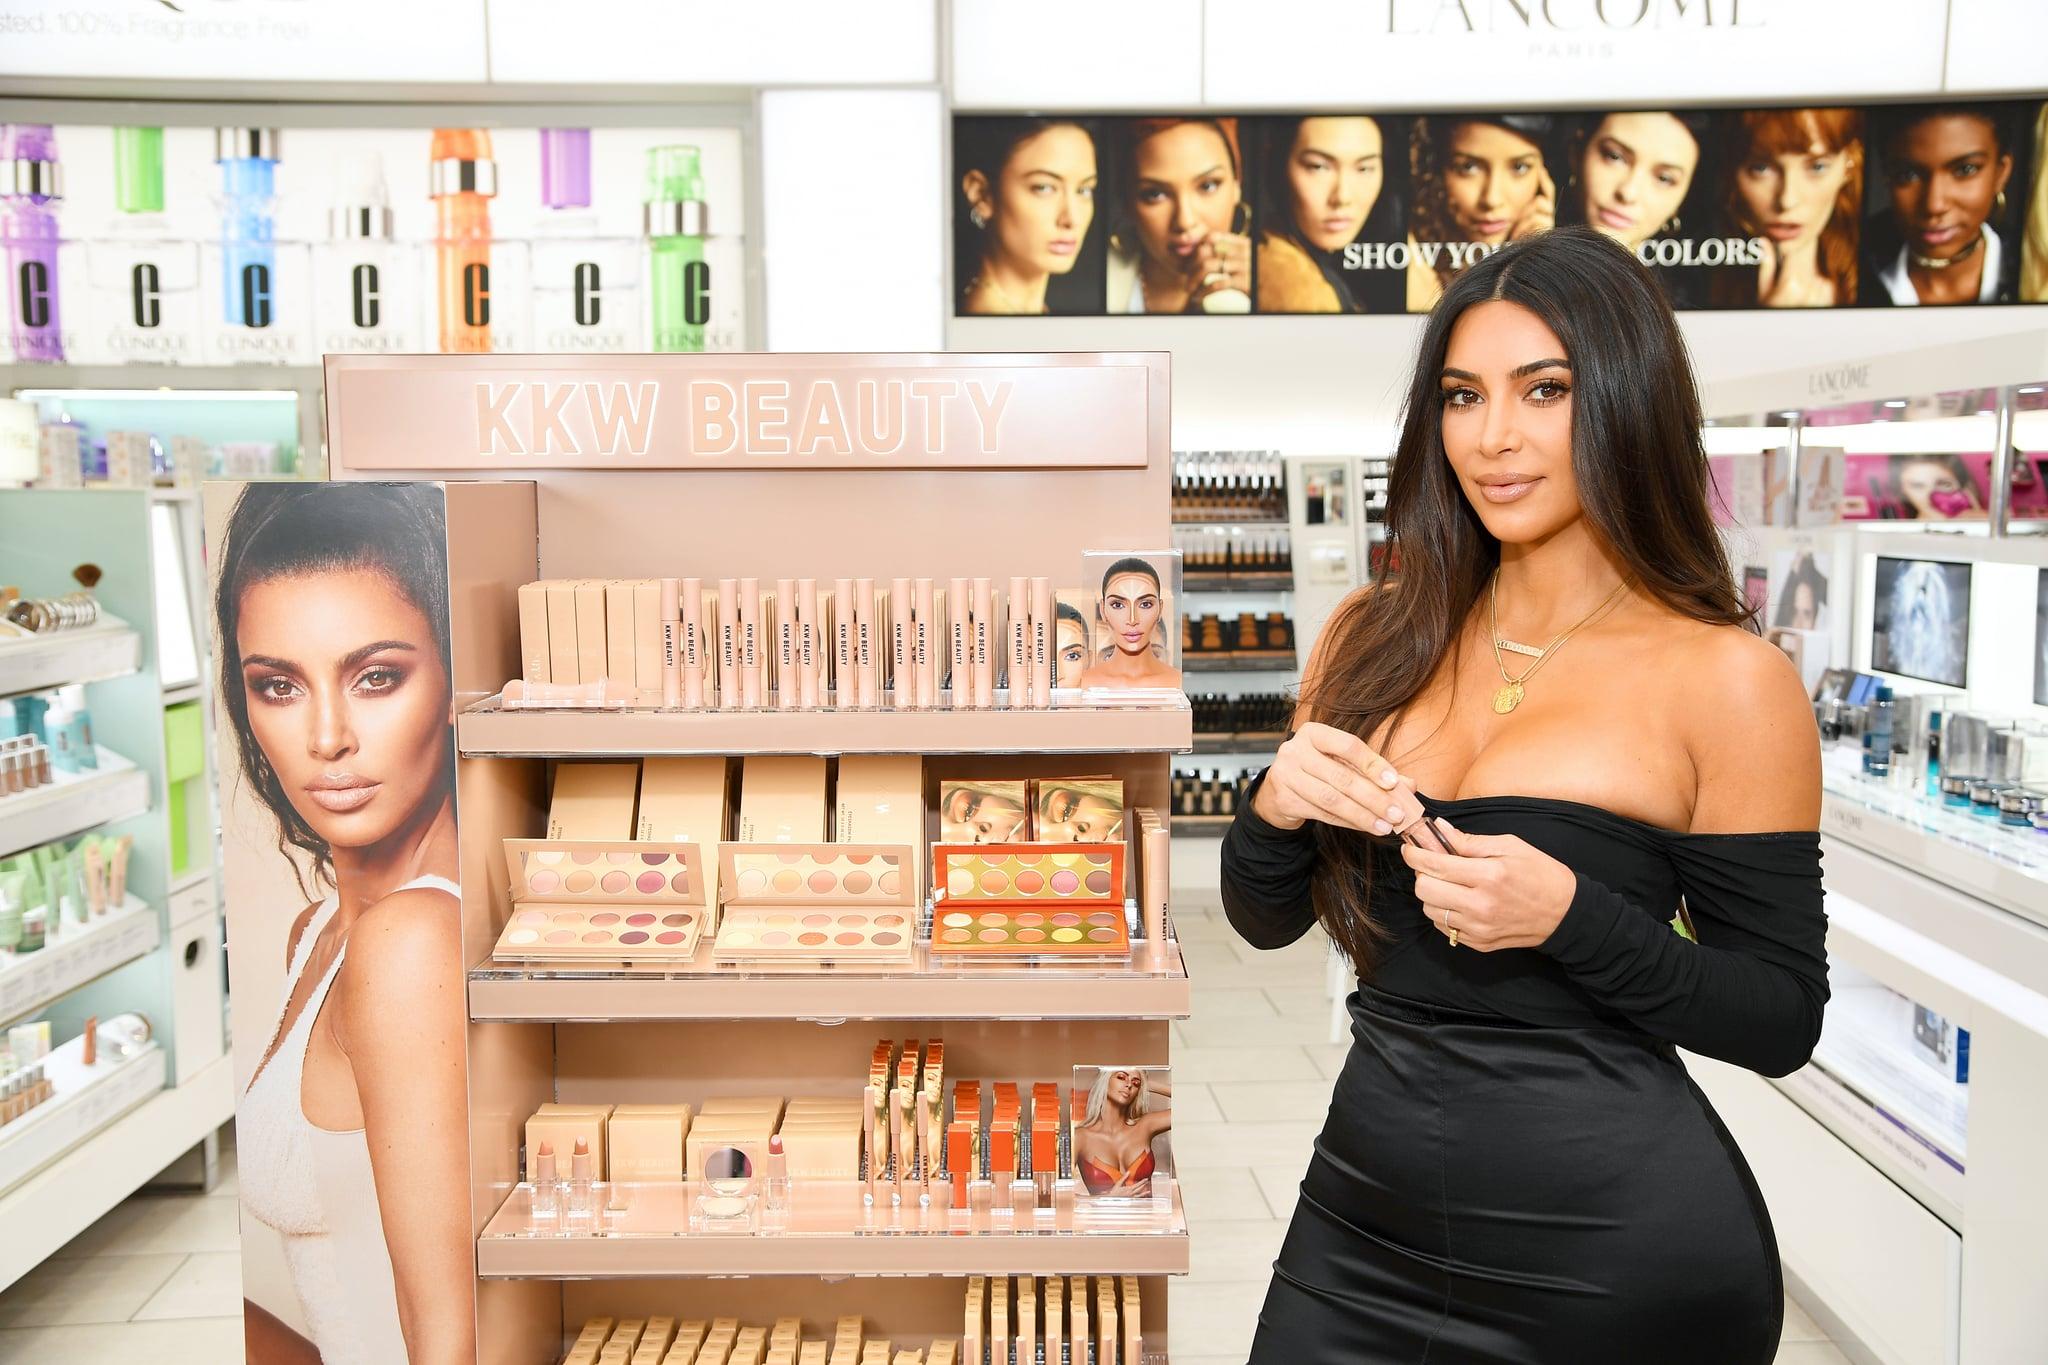 NEW YORK, NEW YORK - OCTOBER 24: Kim Kardashian attends KKW Beauty launch at ULTA Beauty on October 24, 2019 in New York City. (Photo by Dimitrios Kambouris/Getty Images for ULTA Beauty / KKW Beauty)